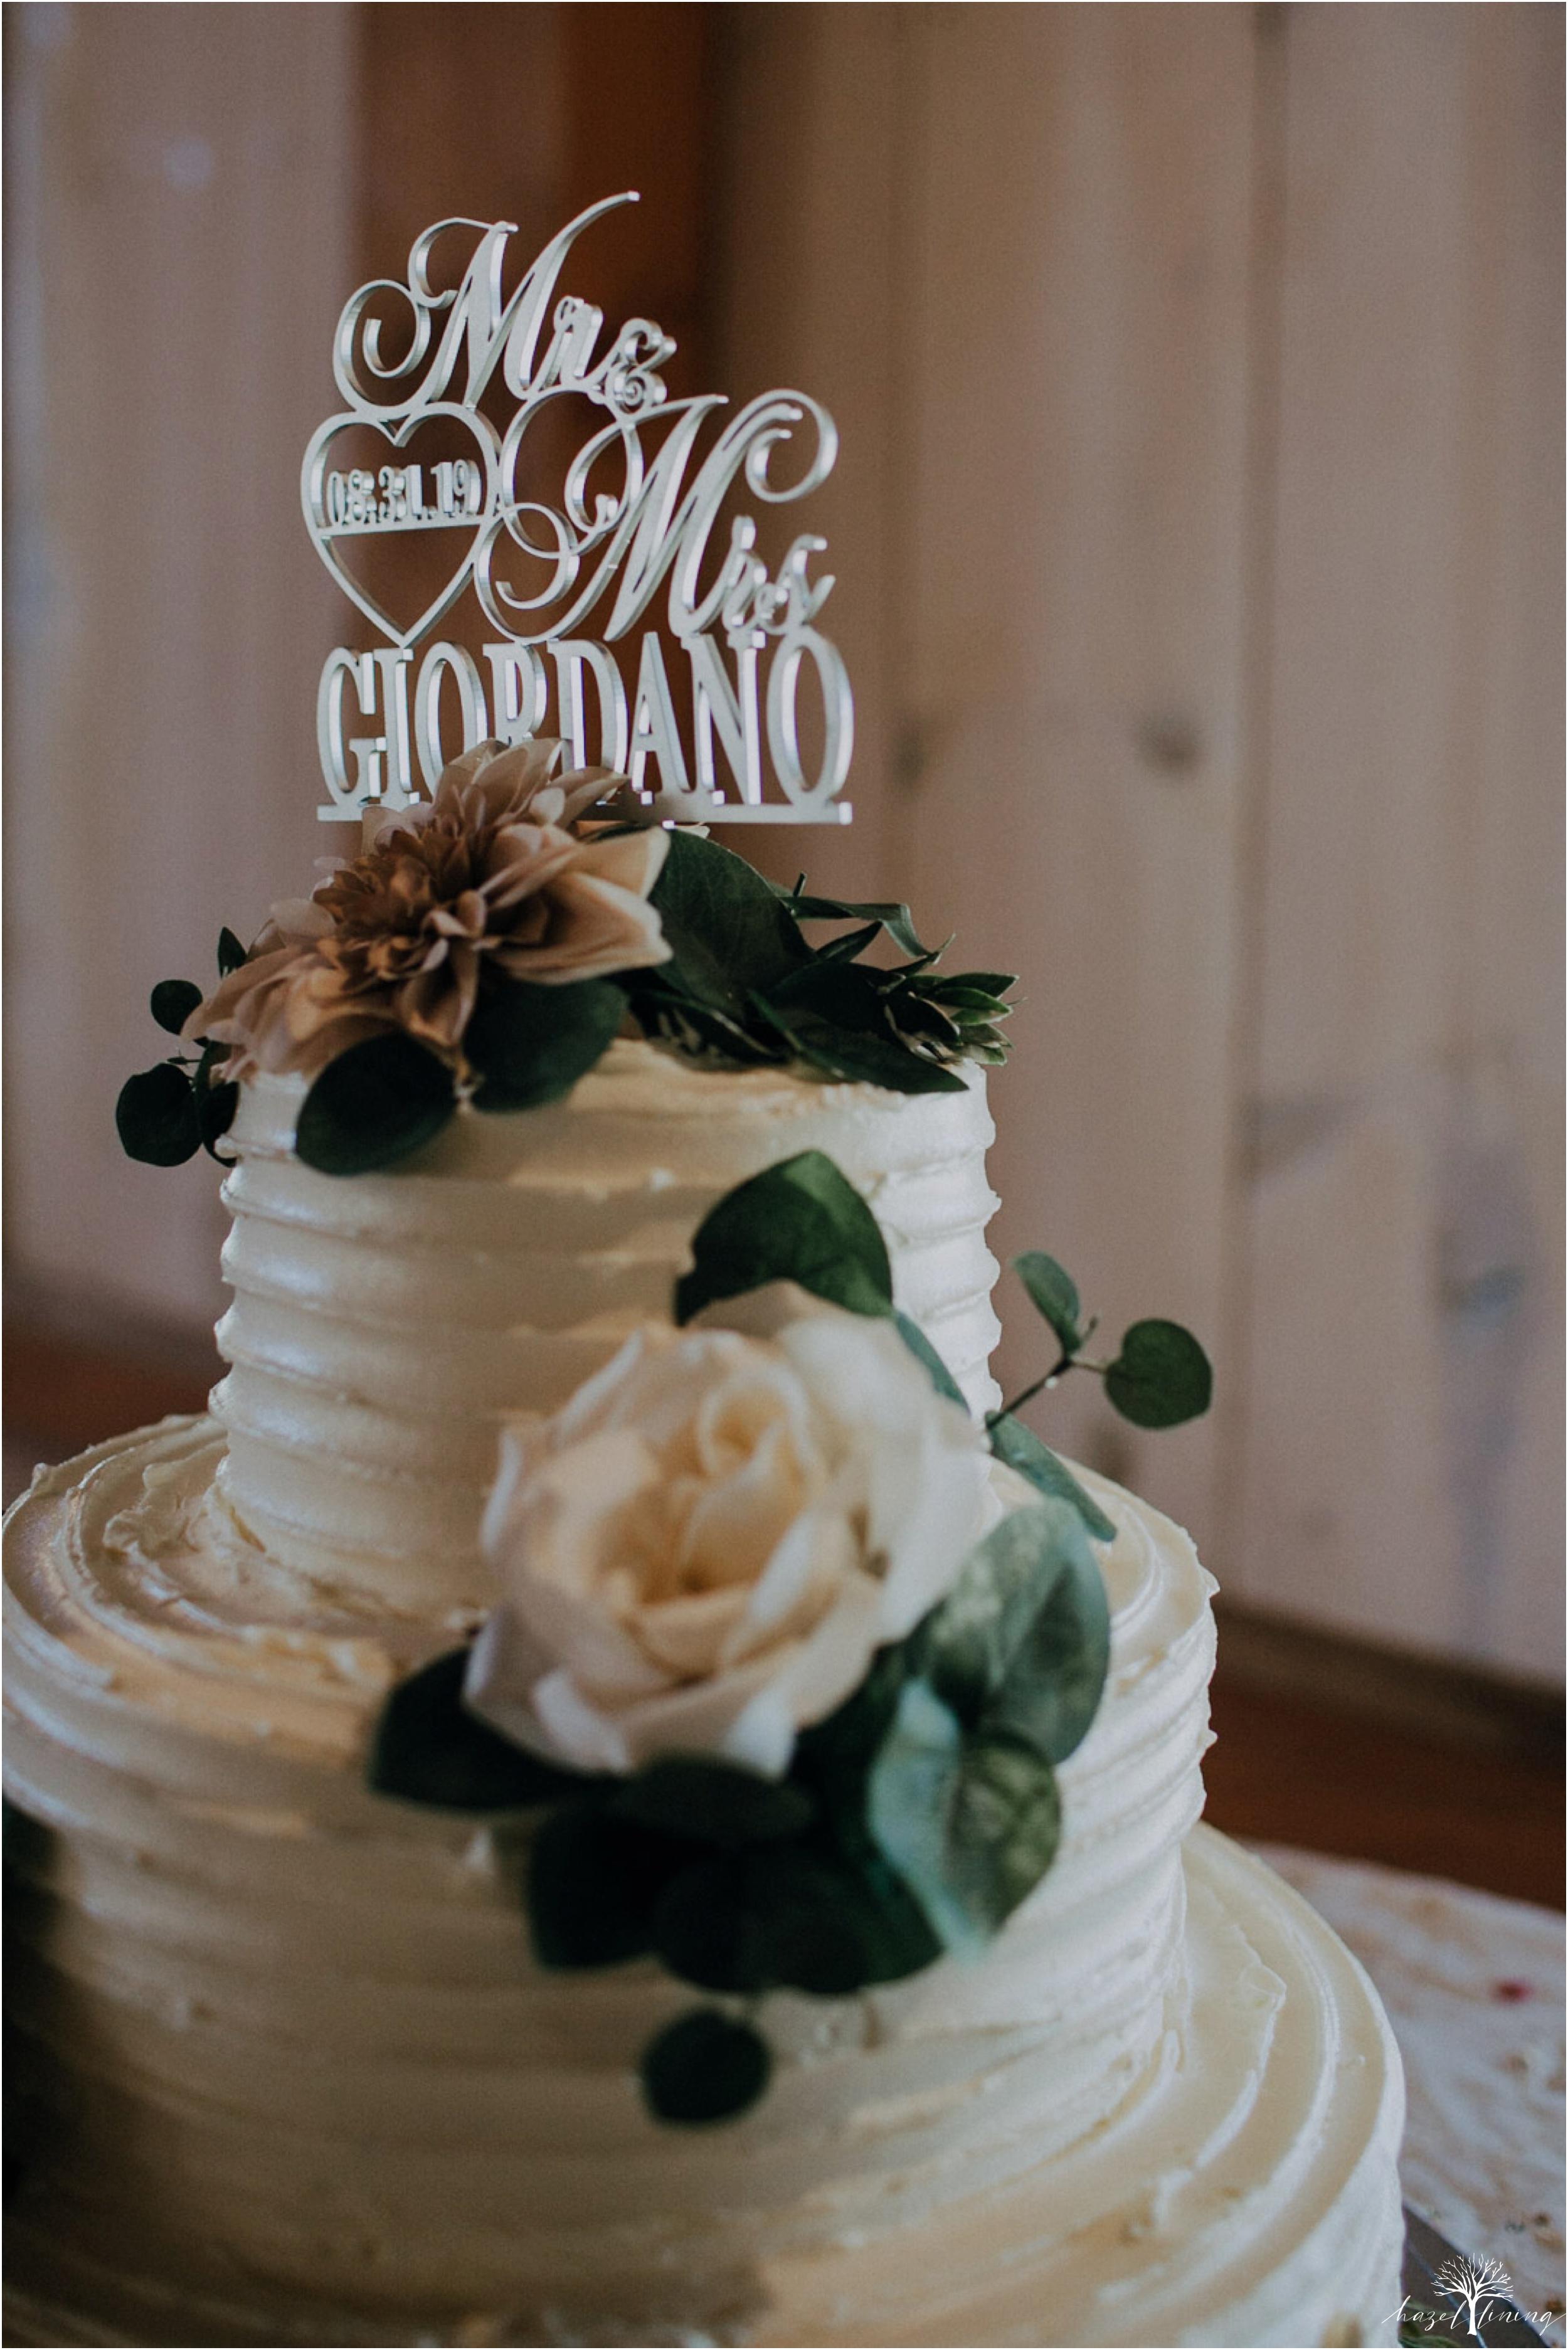 maureen-hepner-anthony-giordano-rose-bank-winery-newtow-pennsylvania-luxury-summer-wedding-hazel-lining-photography-destination-elopement-wedding-engagement-photography_0127.jpg